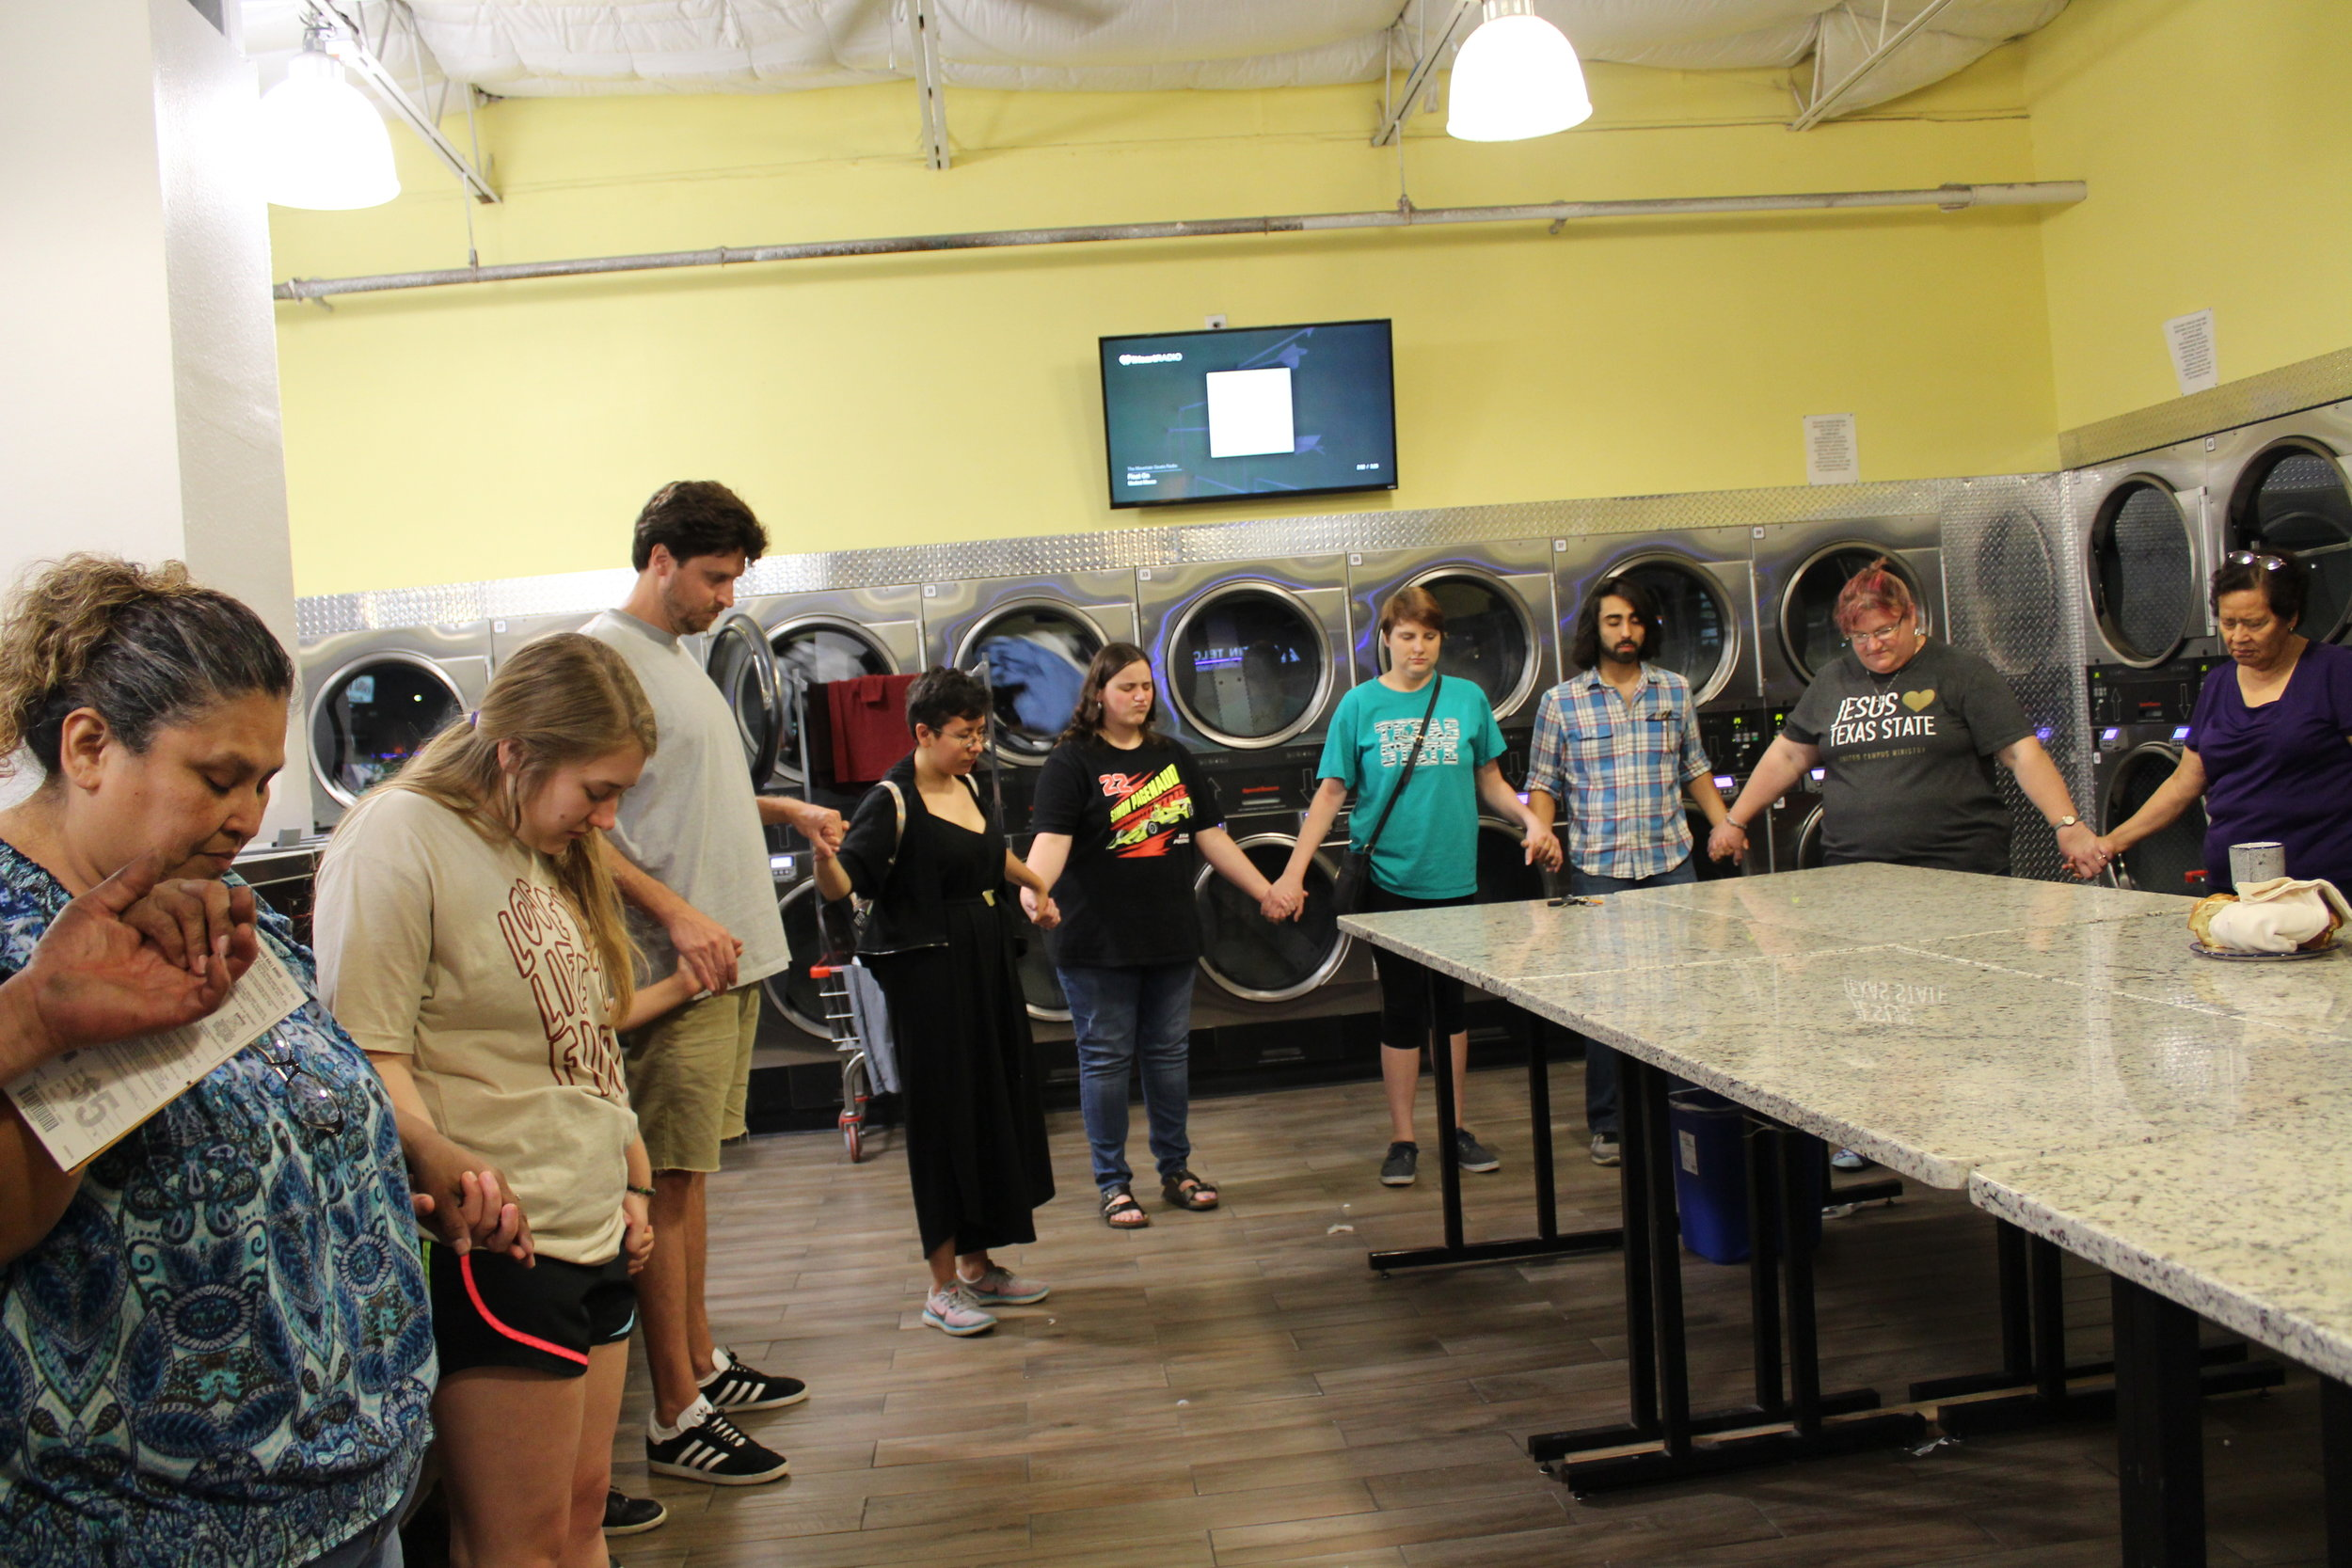 TxSt Laundromat Worship 03.JPG